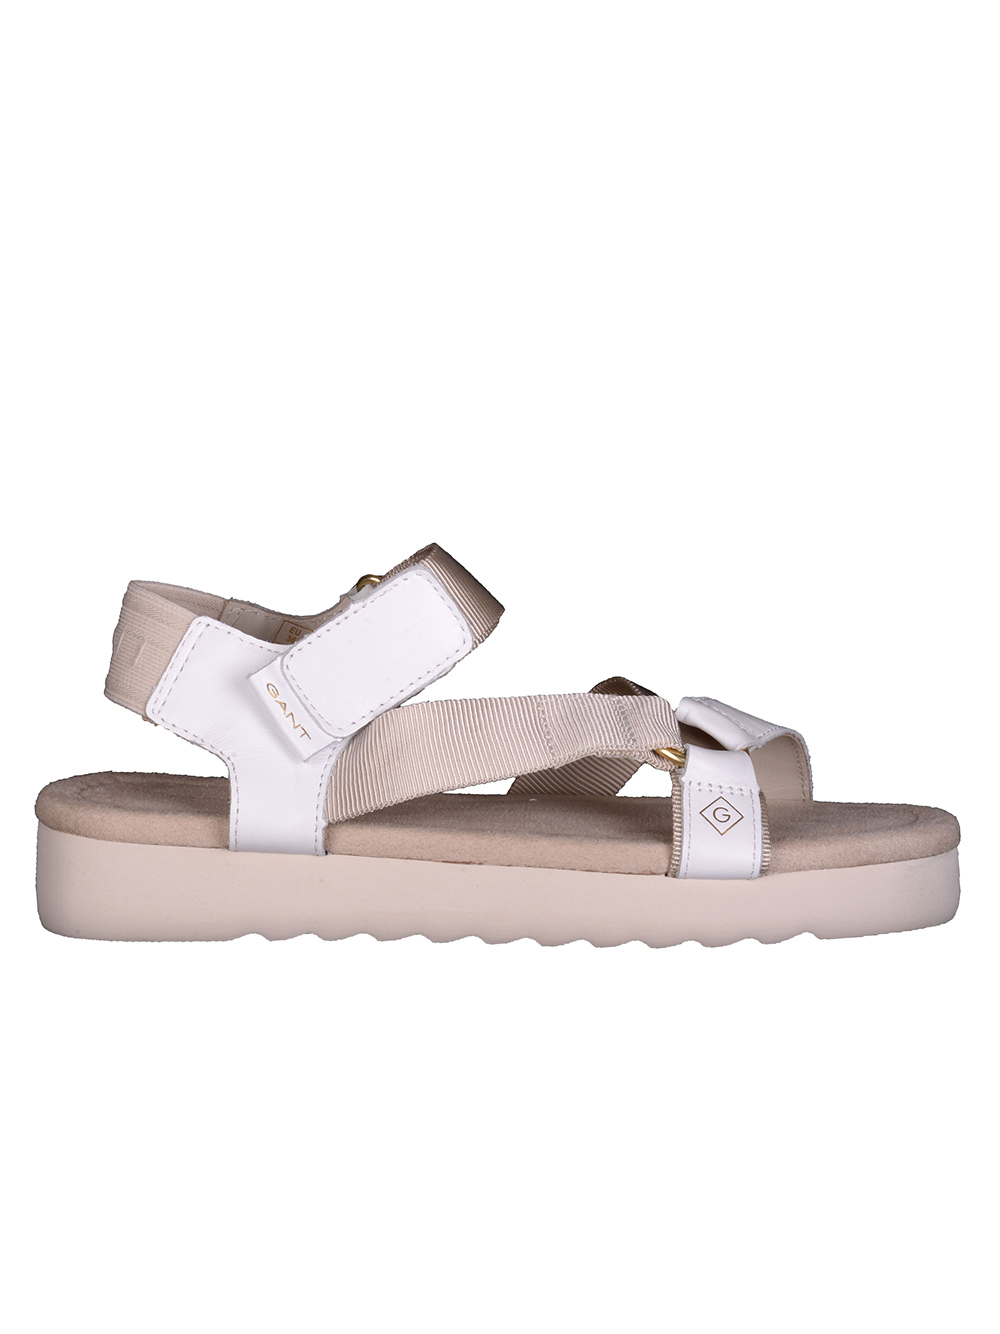 GANT Παπούτσια γυναικεία 3GS22507601-75 G275